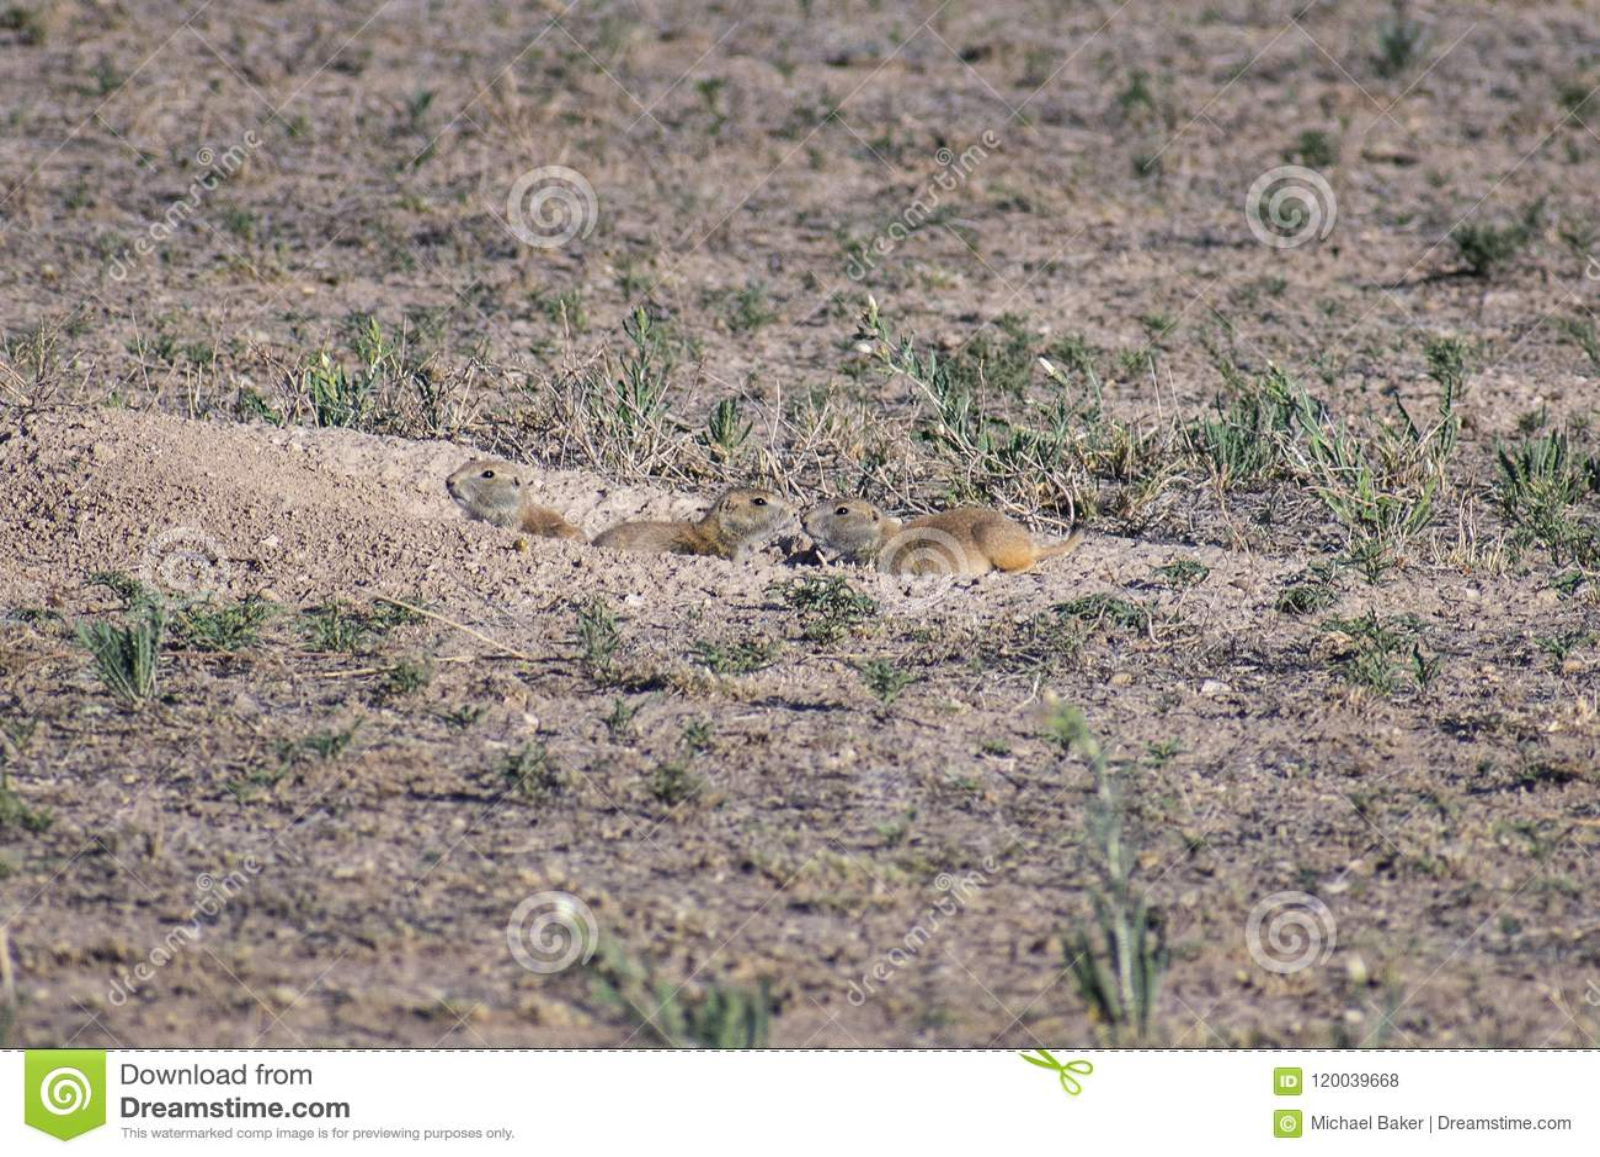 Prairie Dog Companions, Nestled in the Doorway